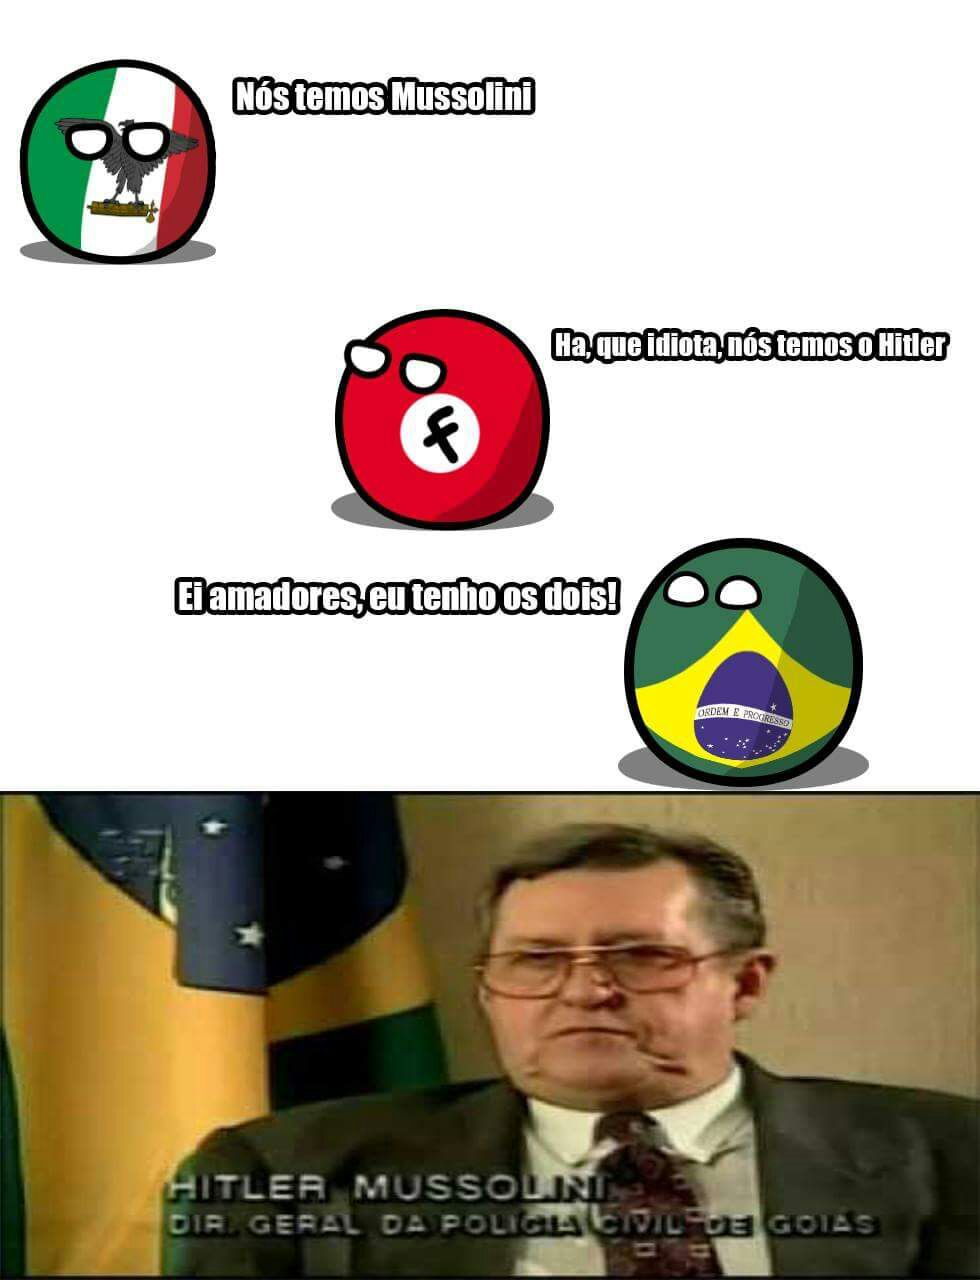 Heueheueheuebejebejb - meme